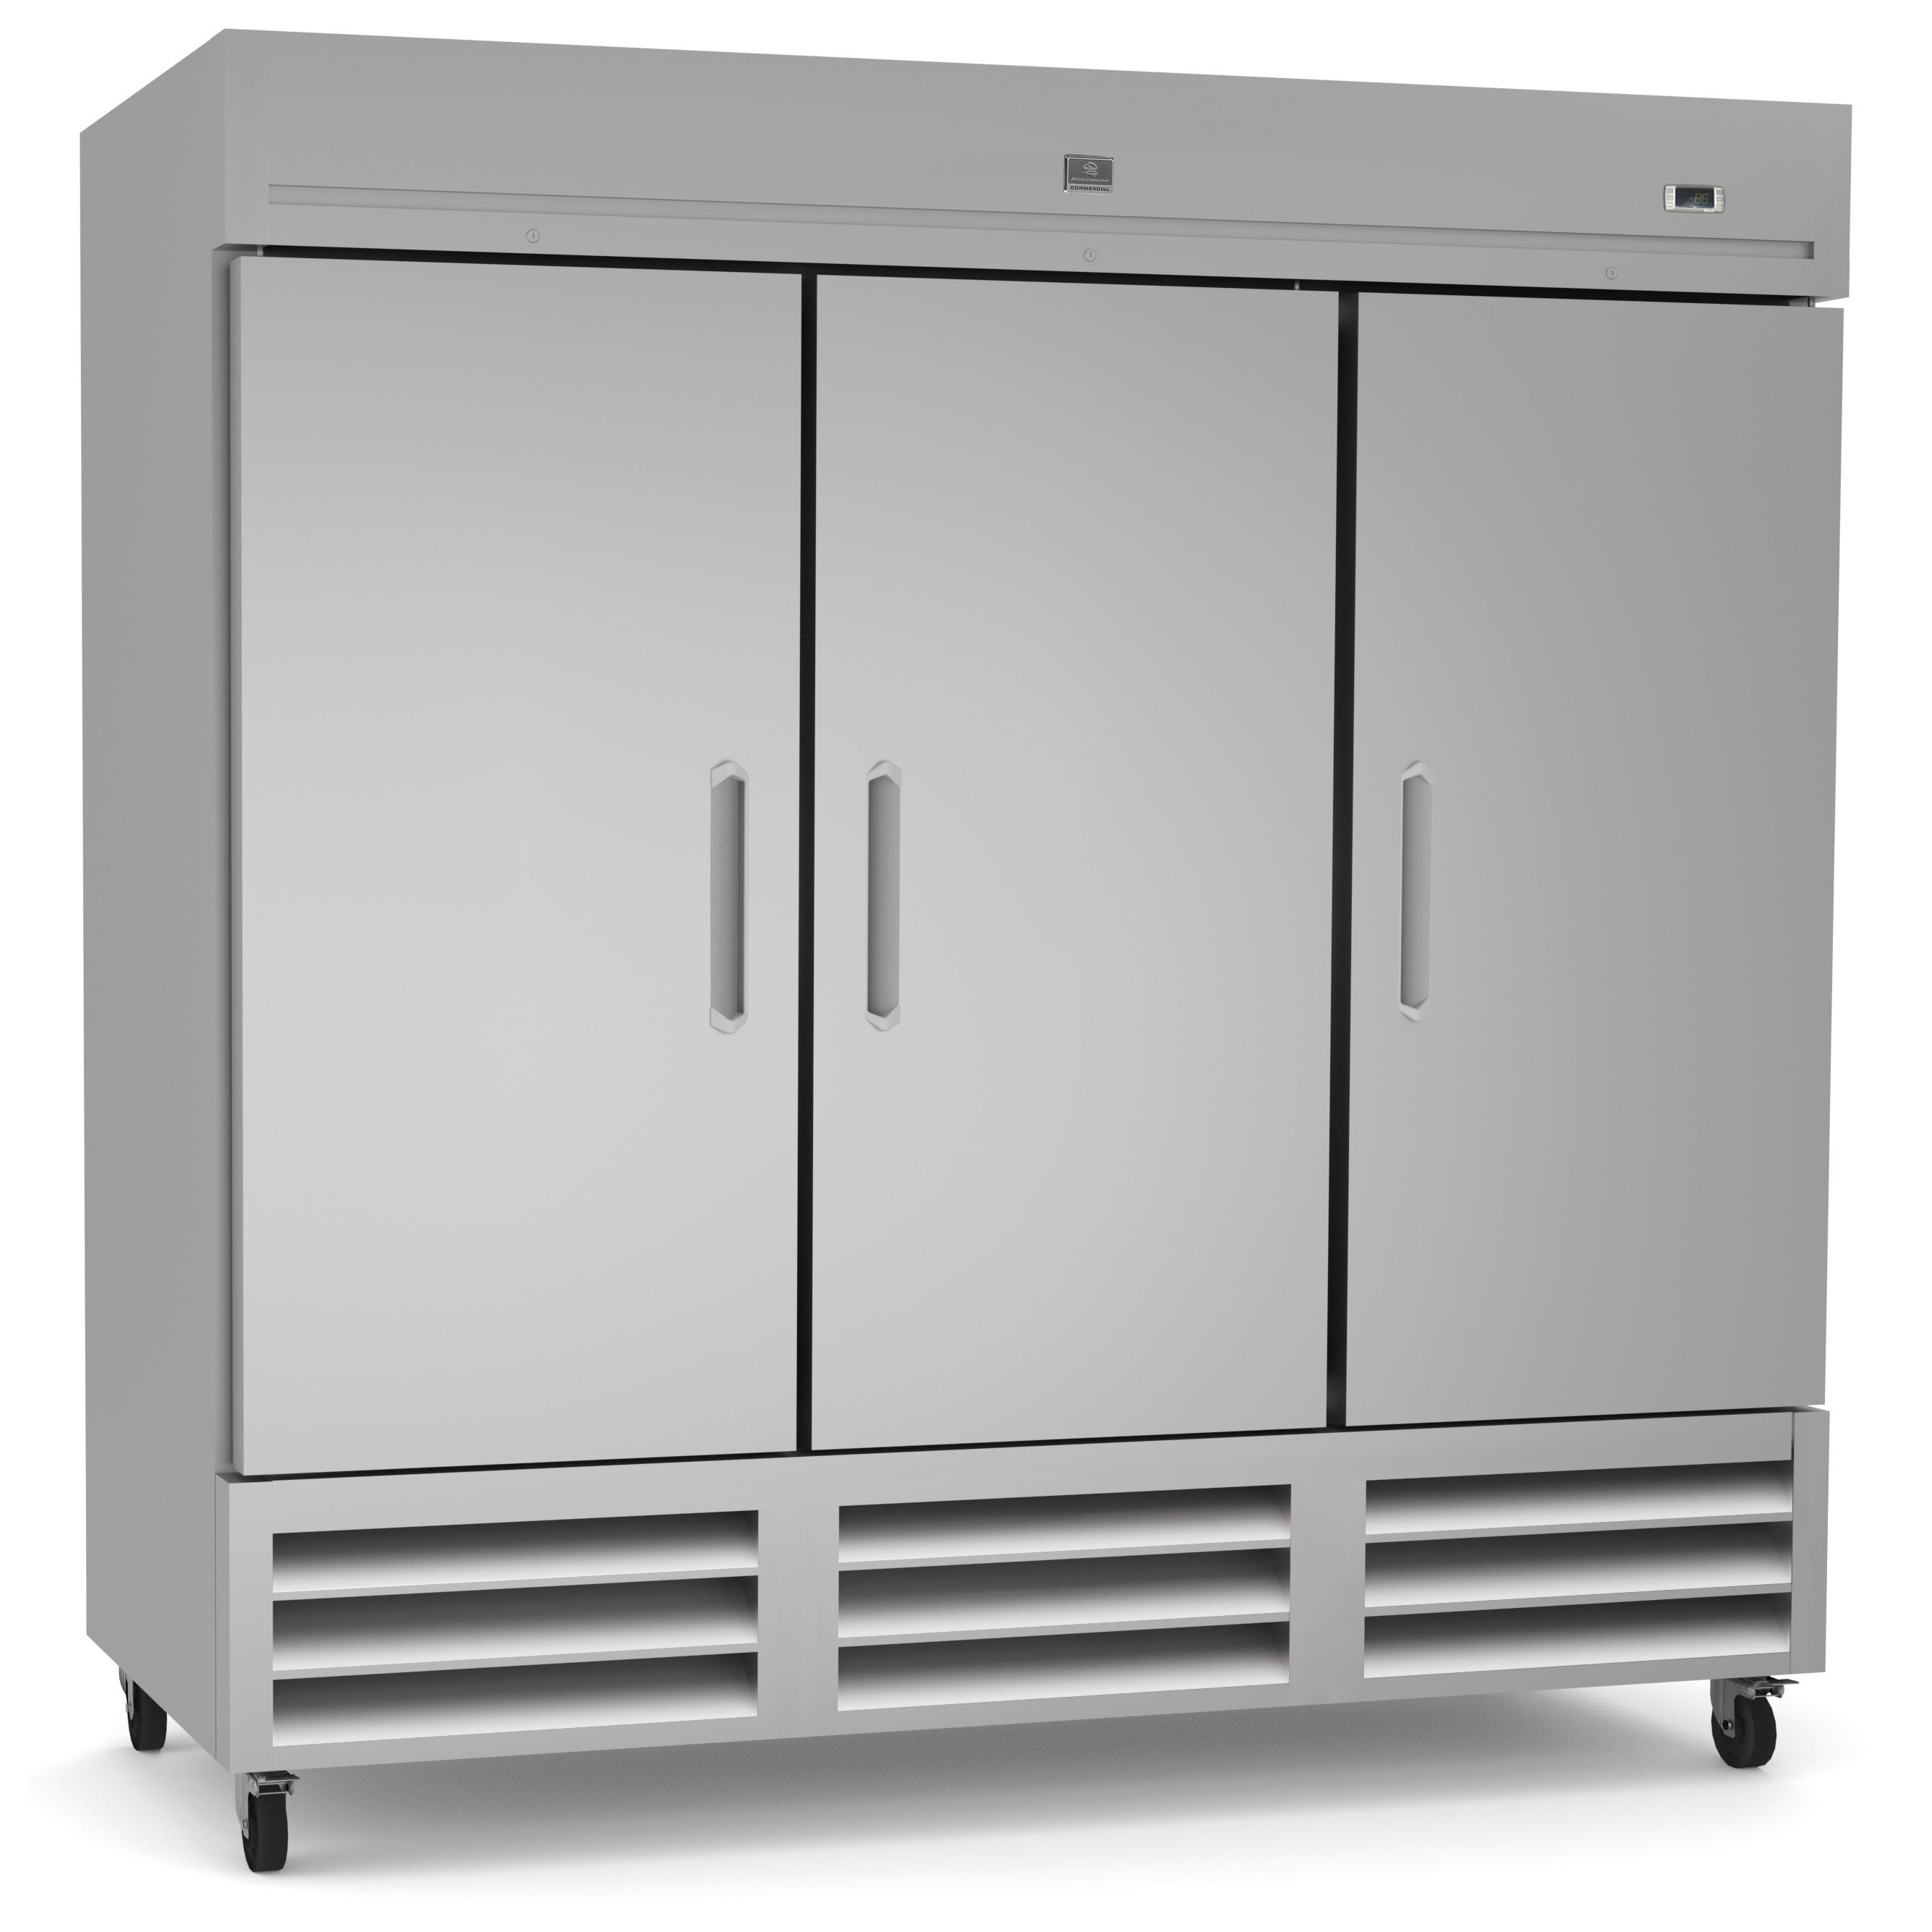 Kelvinator Commercial KCHRI81R3DRE refrigerator, reach-in